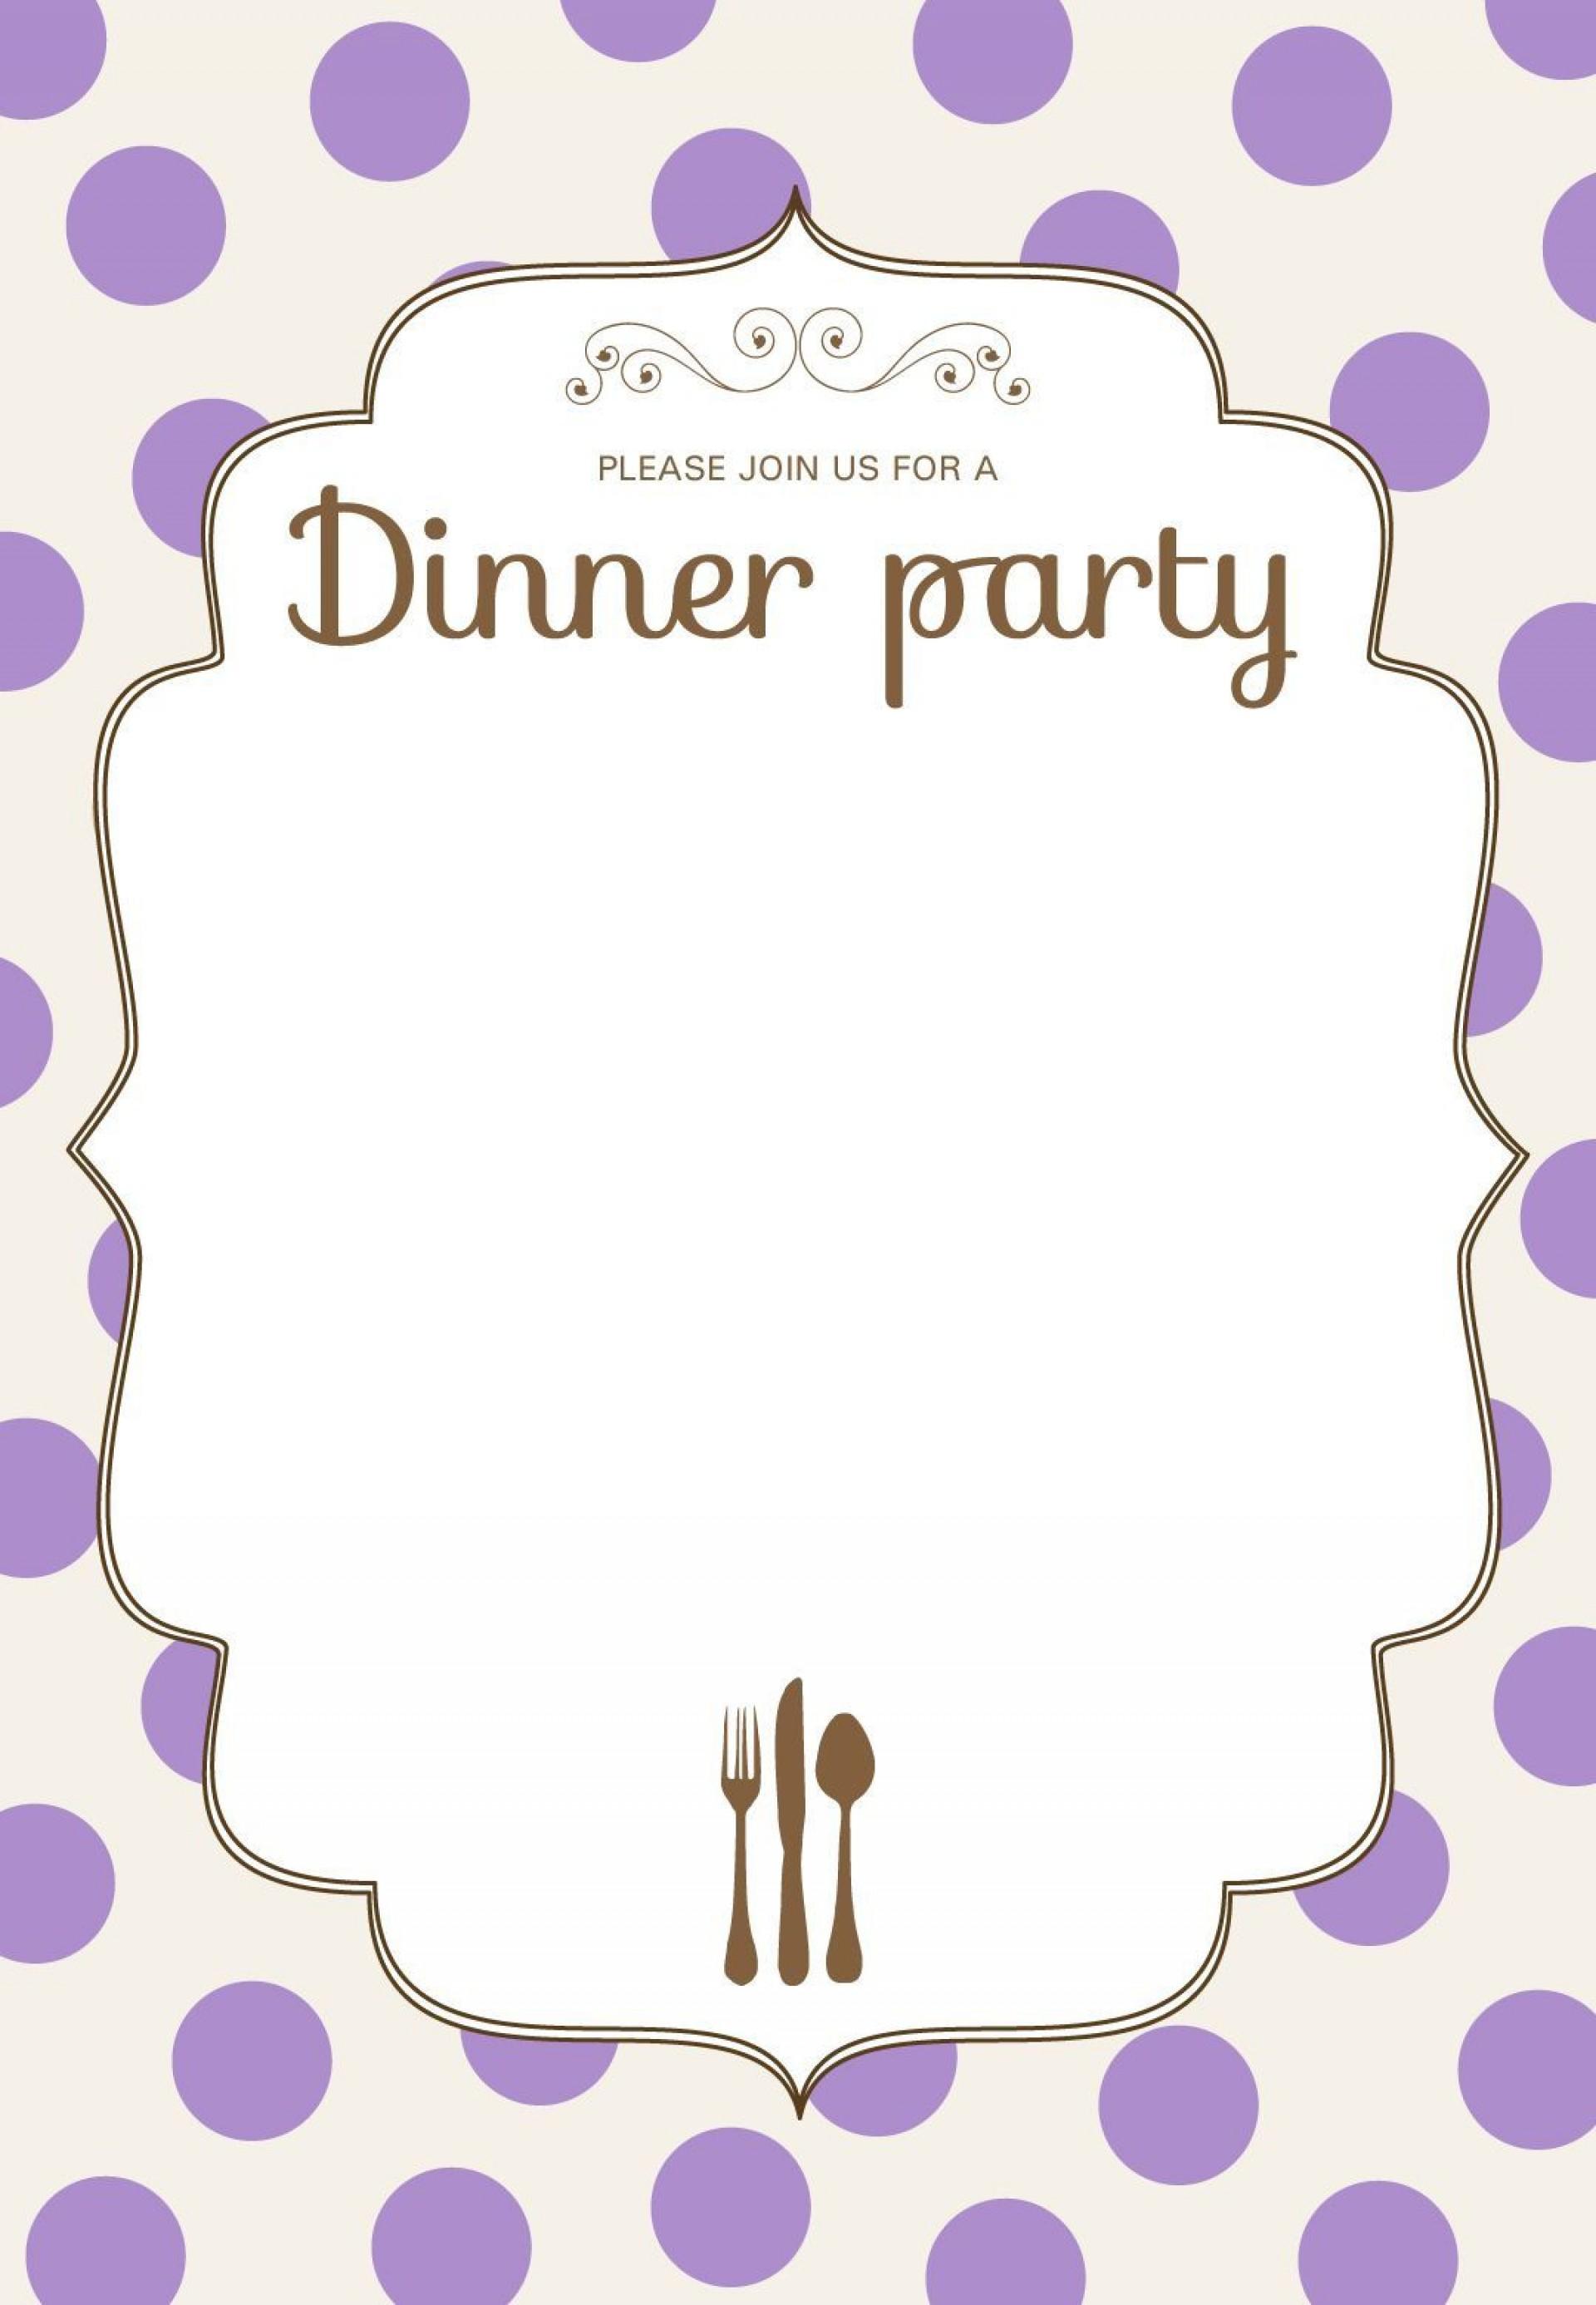 009 Stirring Free Dinner Invitation Template Highest Clarity  Templates Rehearsal Printable Italian Thanksgiving1920